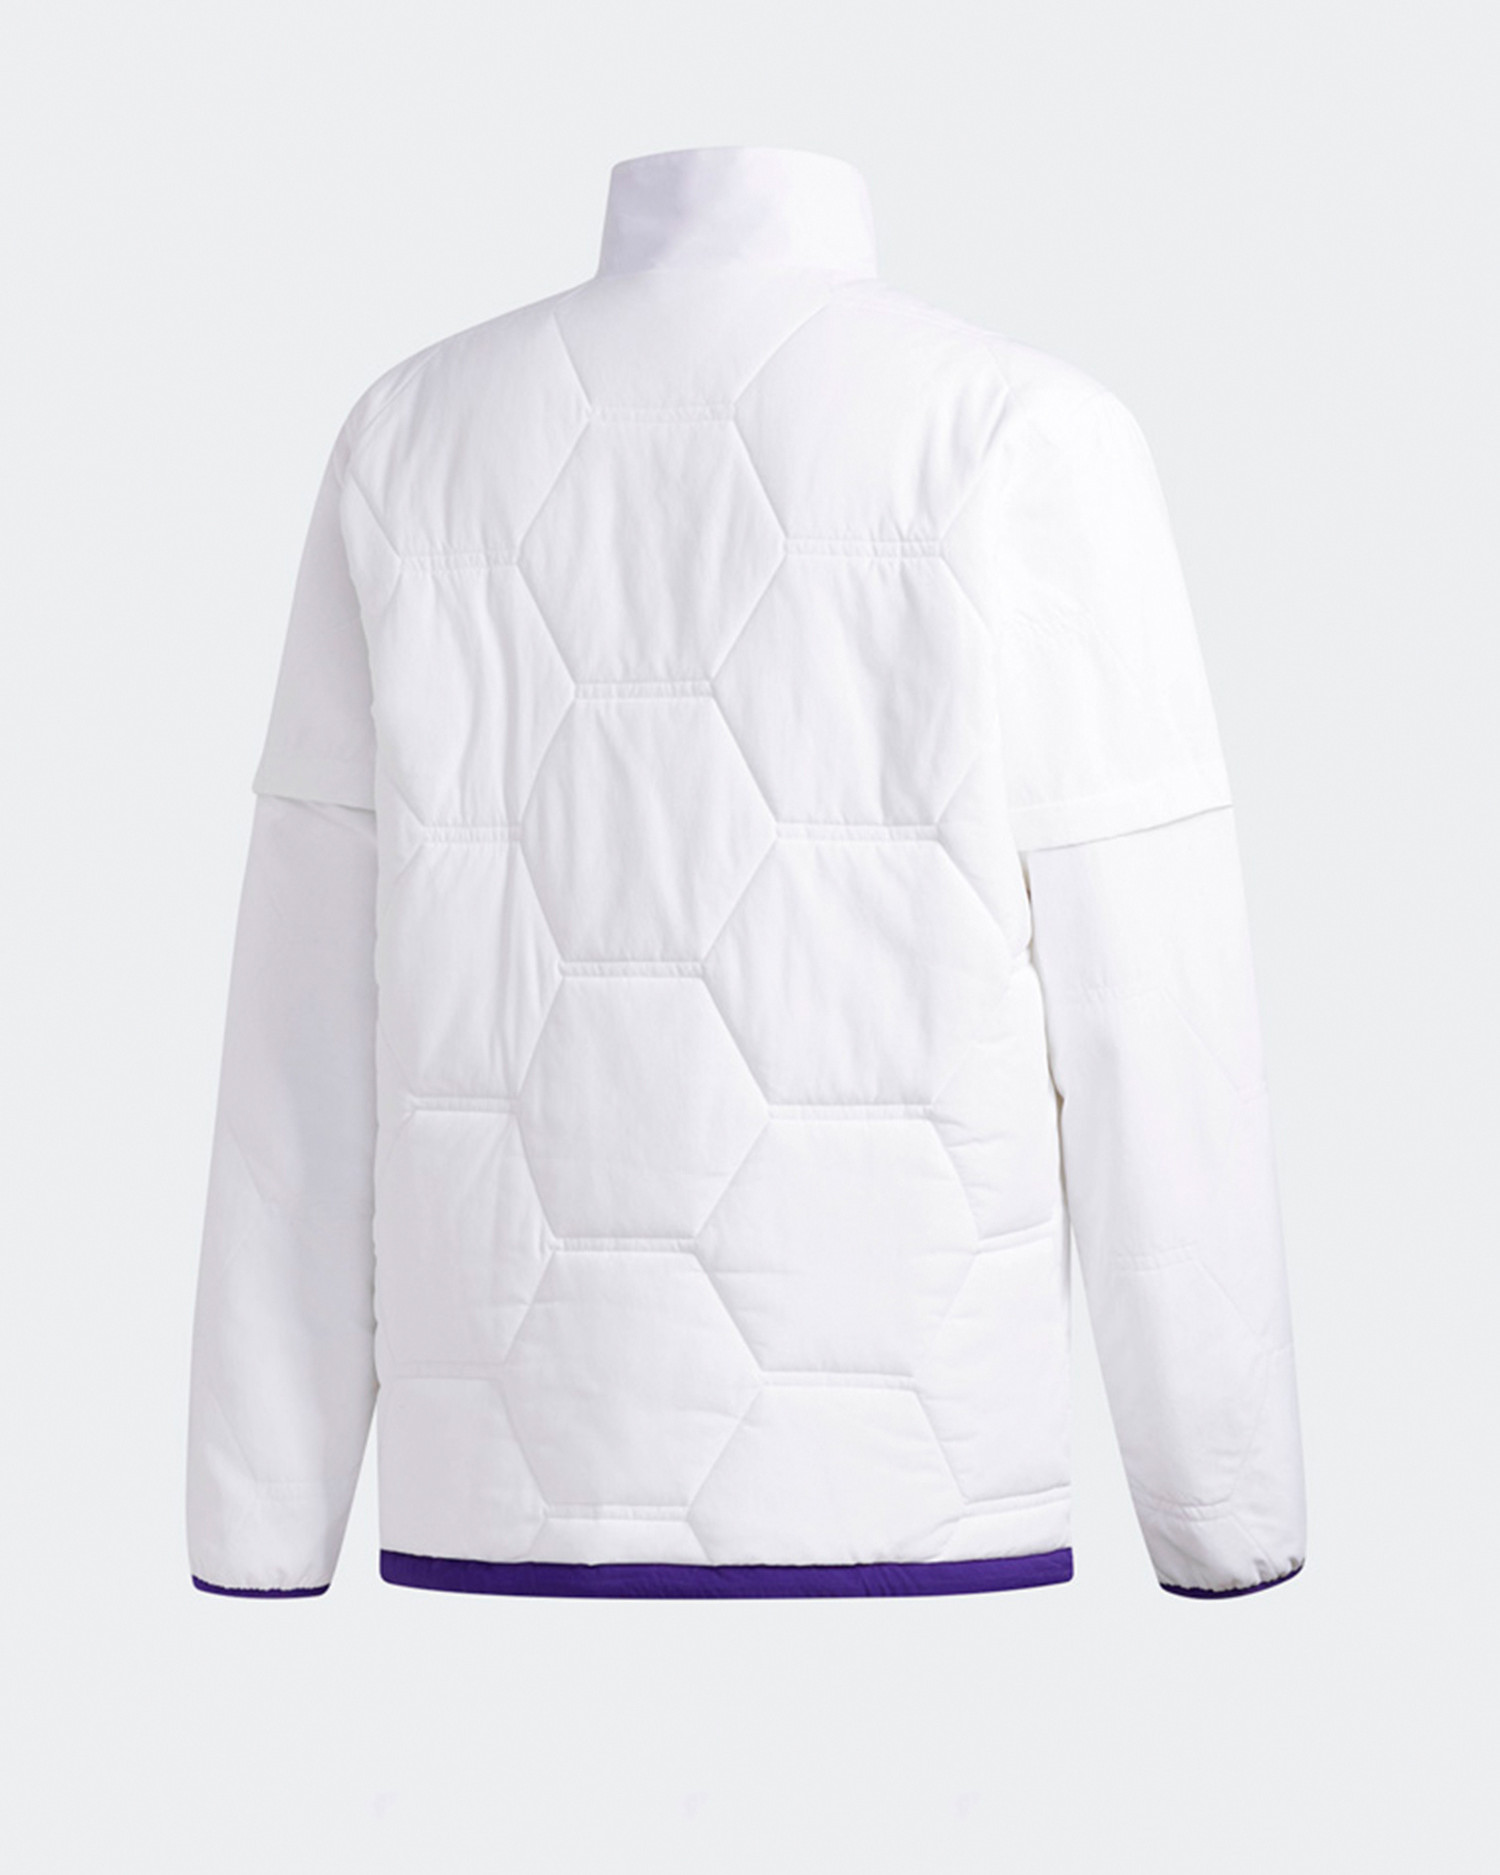 Adidas X Hardies jckt             white/cpurpl